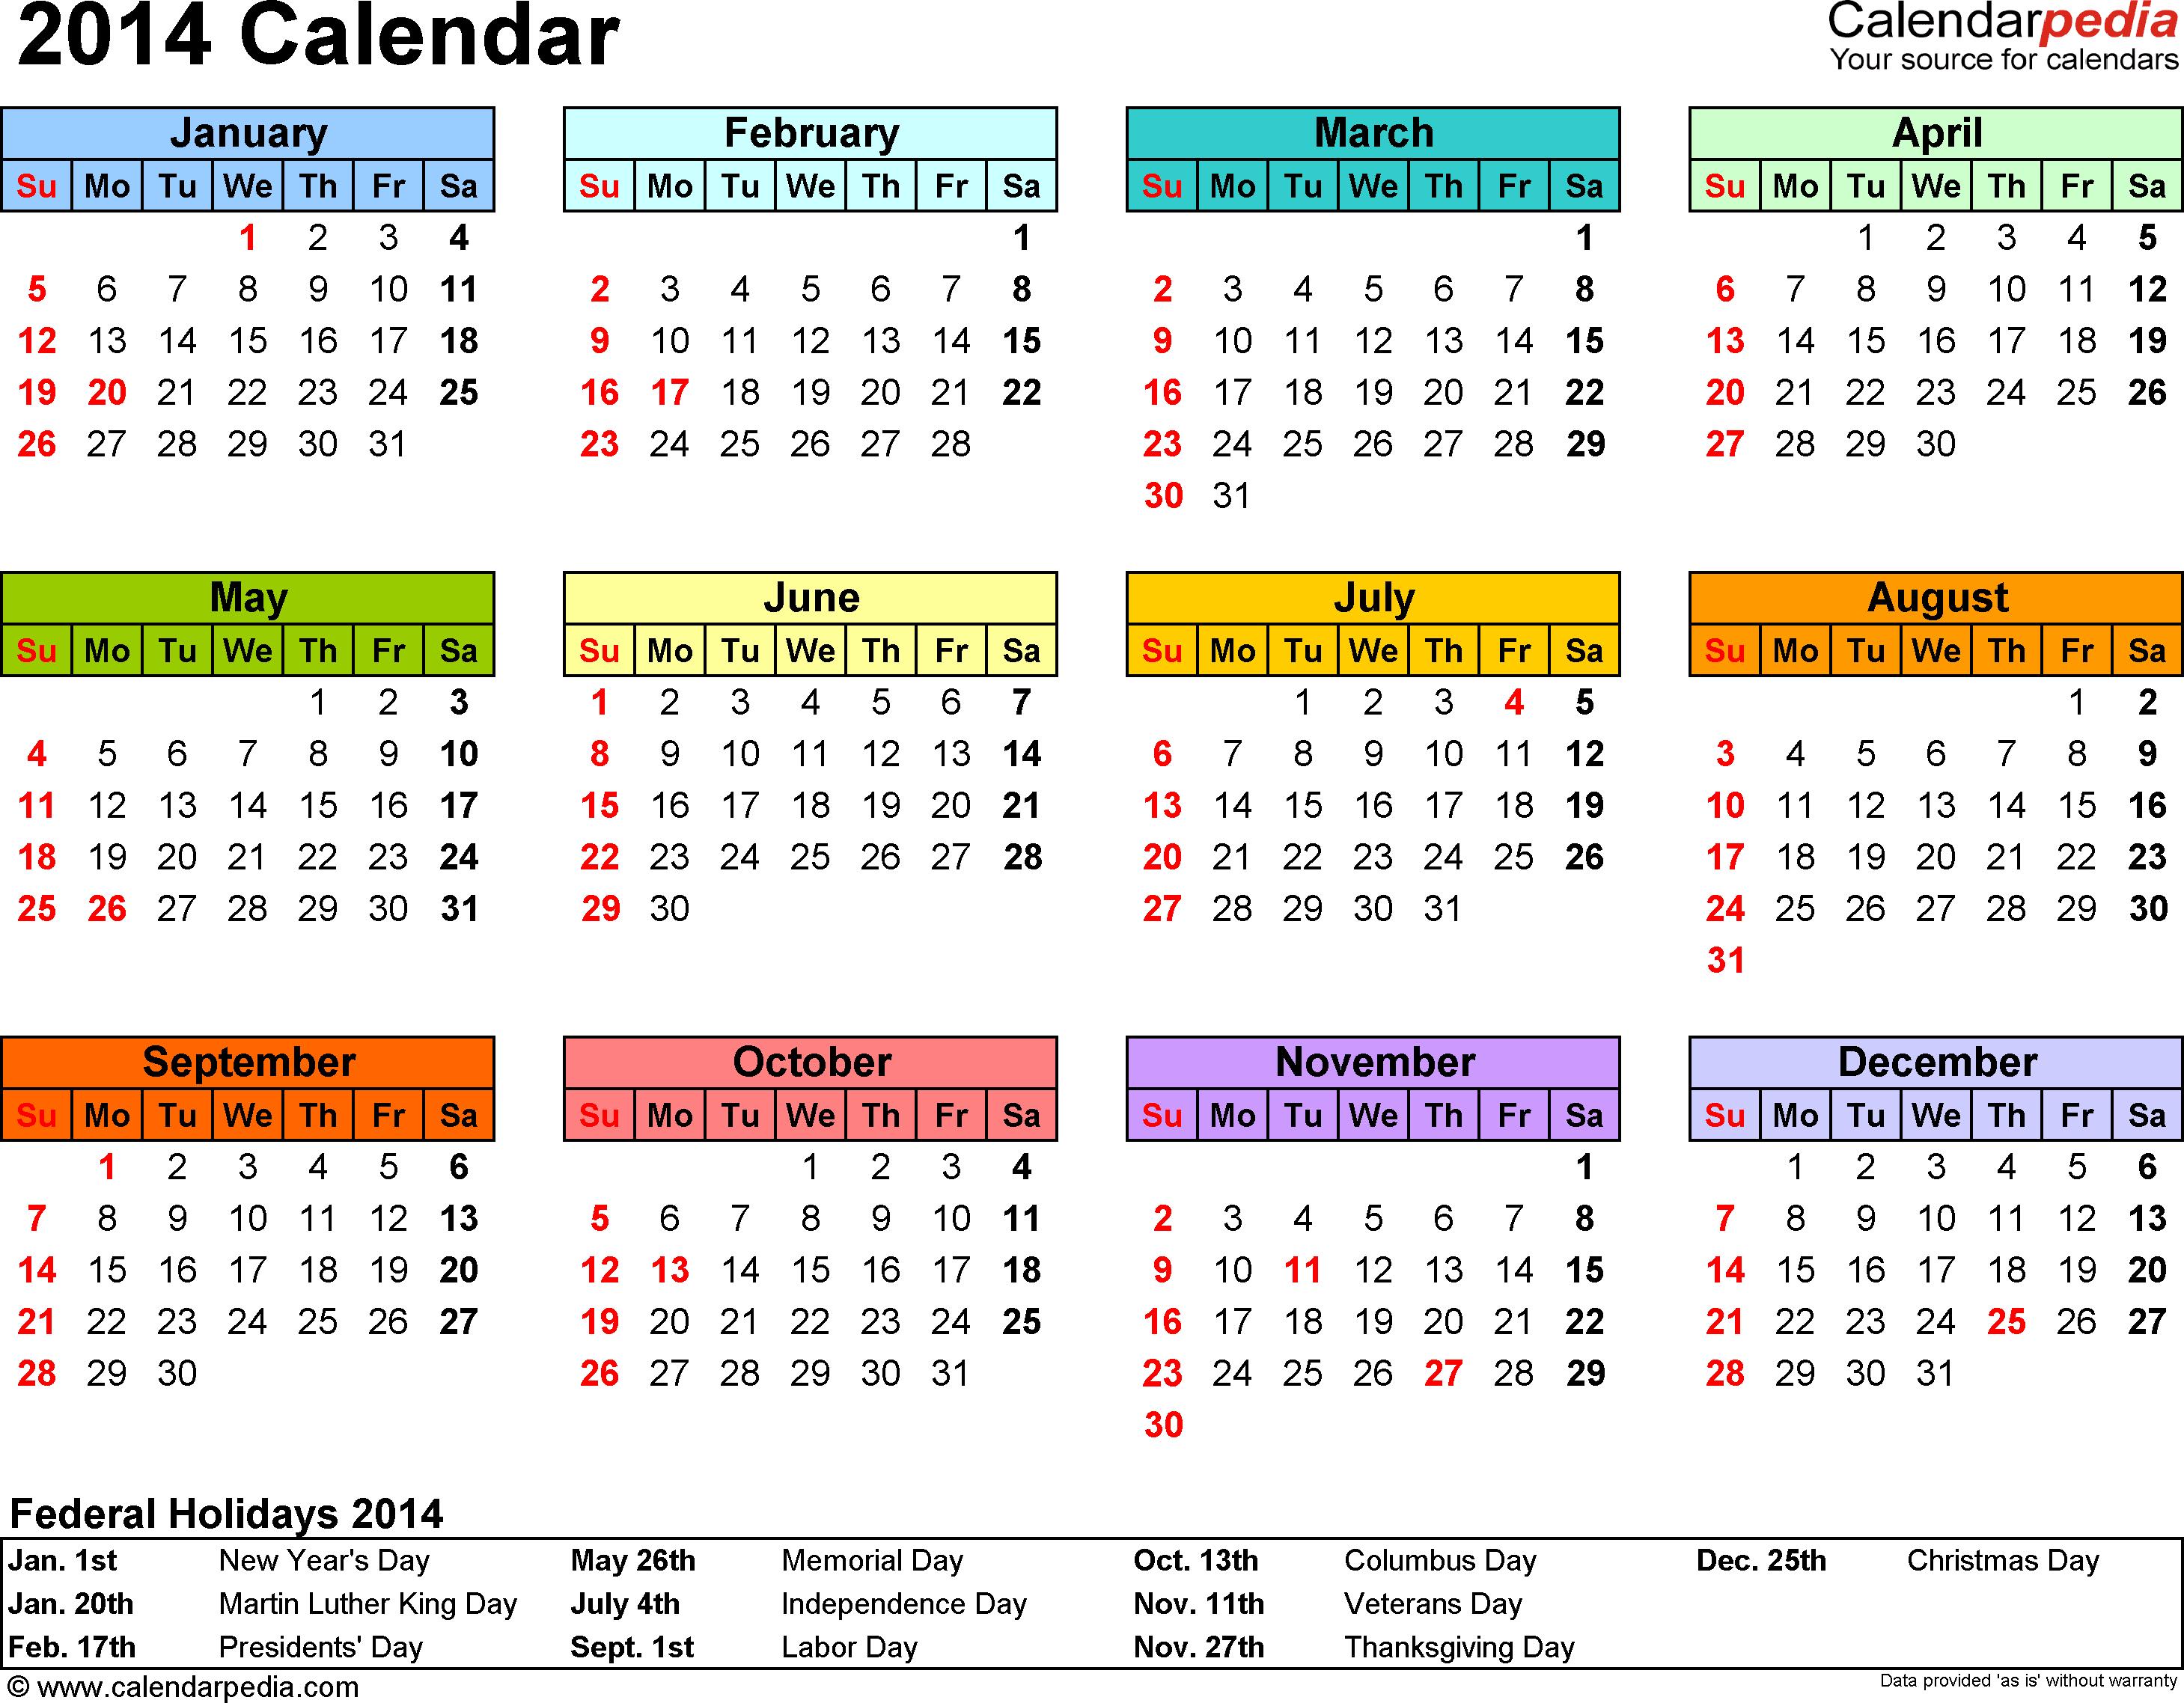 2014 Calendar - 13 Free Printable Word Calendar Templates with 2014 12 Month Blank Calendar